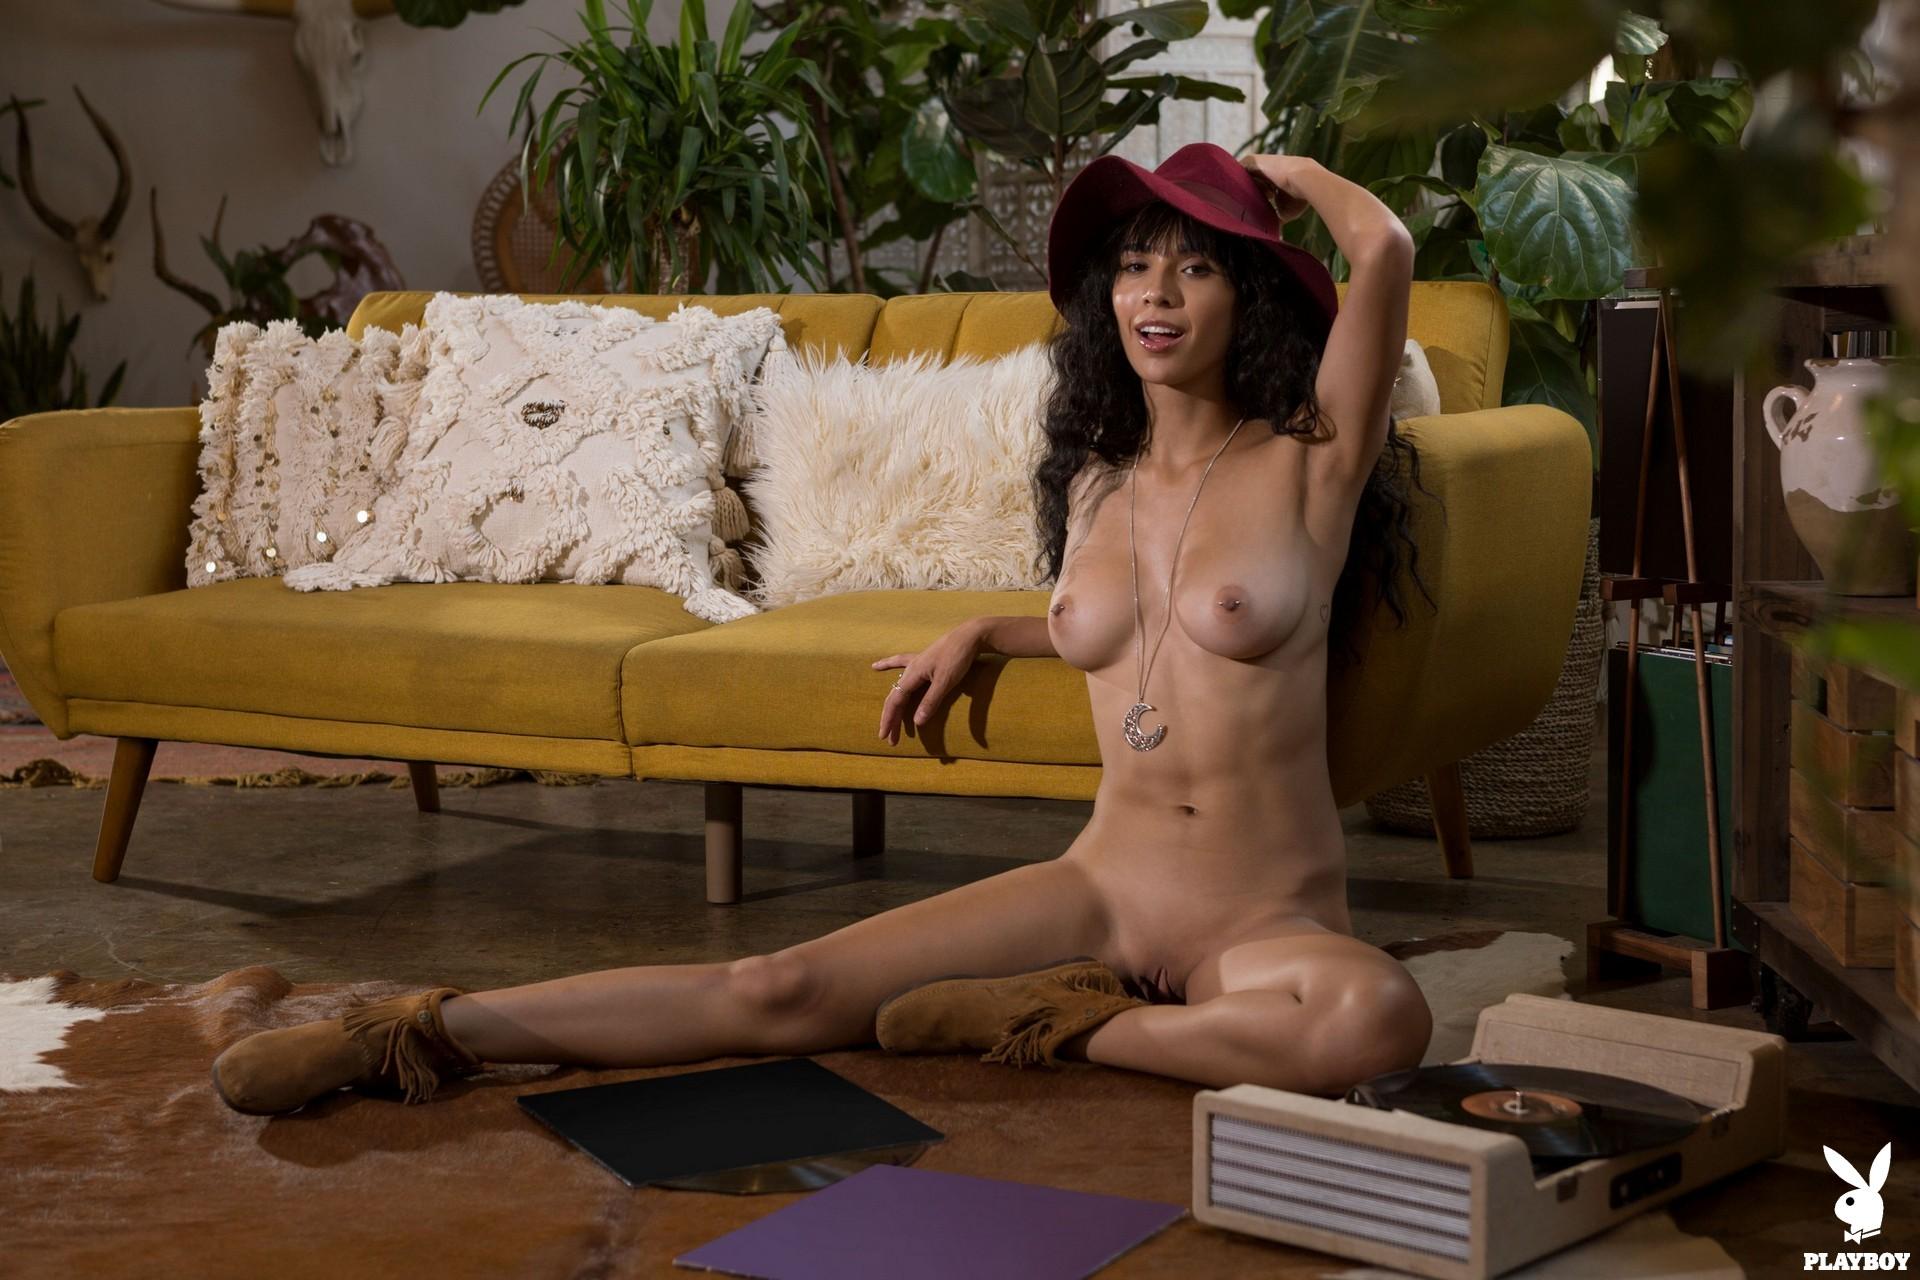 Erika De Leija in Funky and Free - Playboy Plus 36